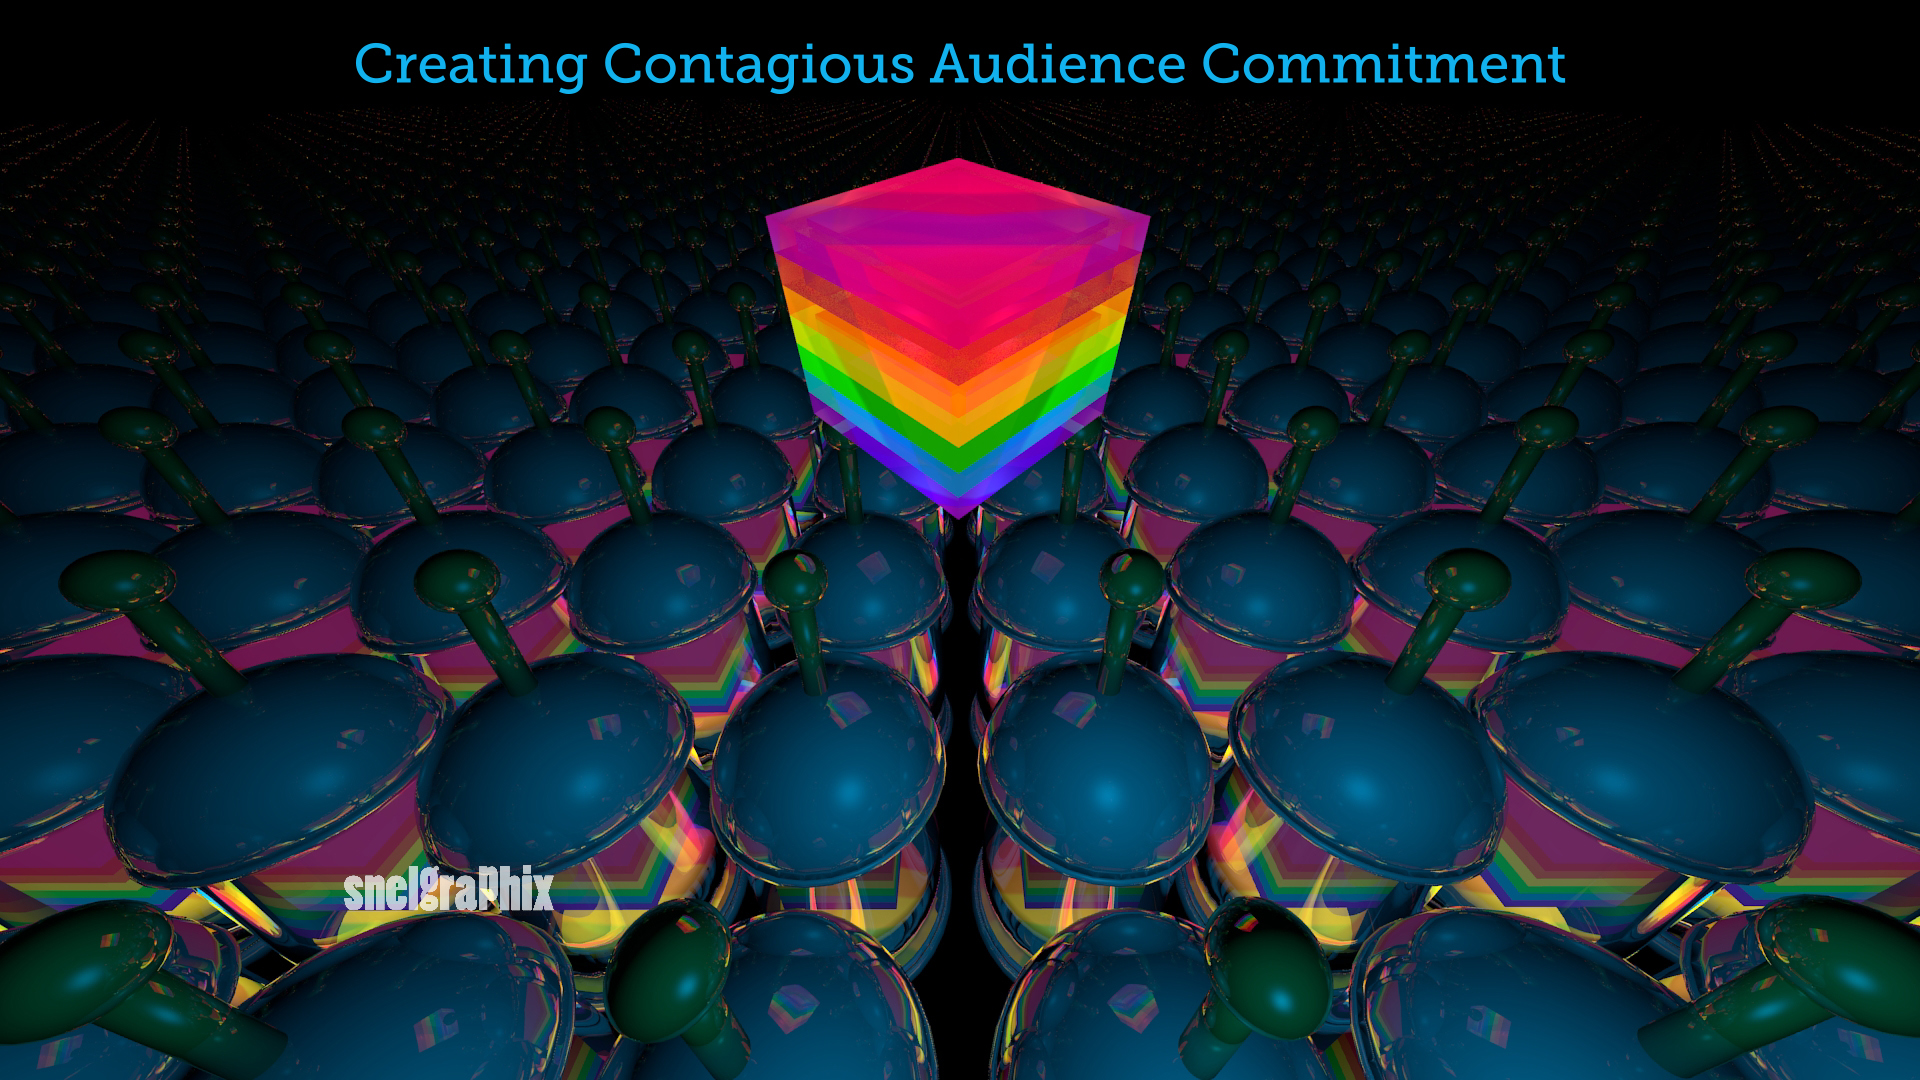 Snelgraphix creating contagious audience commitment.